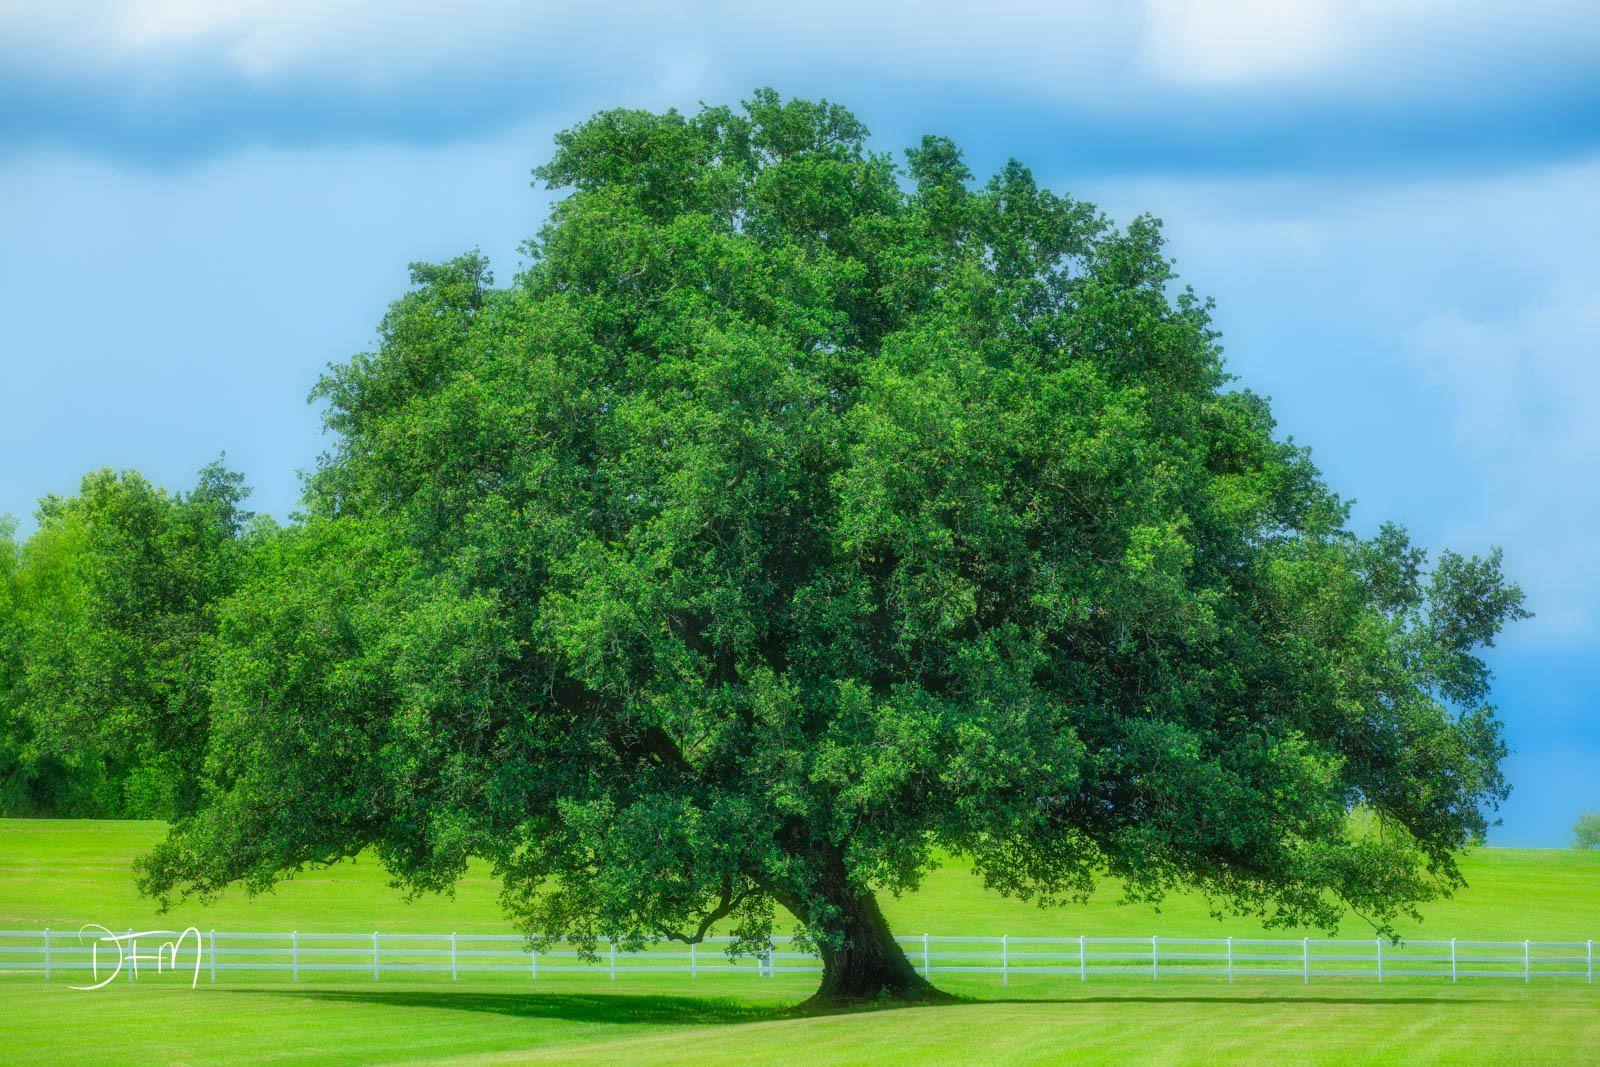 A magnificient lone Oak Tree on the Alley of Oaks Plantation, Vacherie LA.